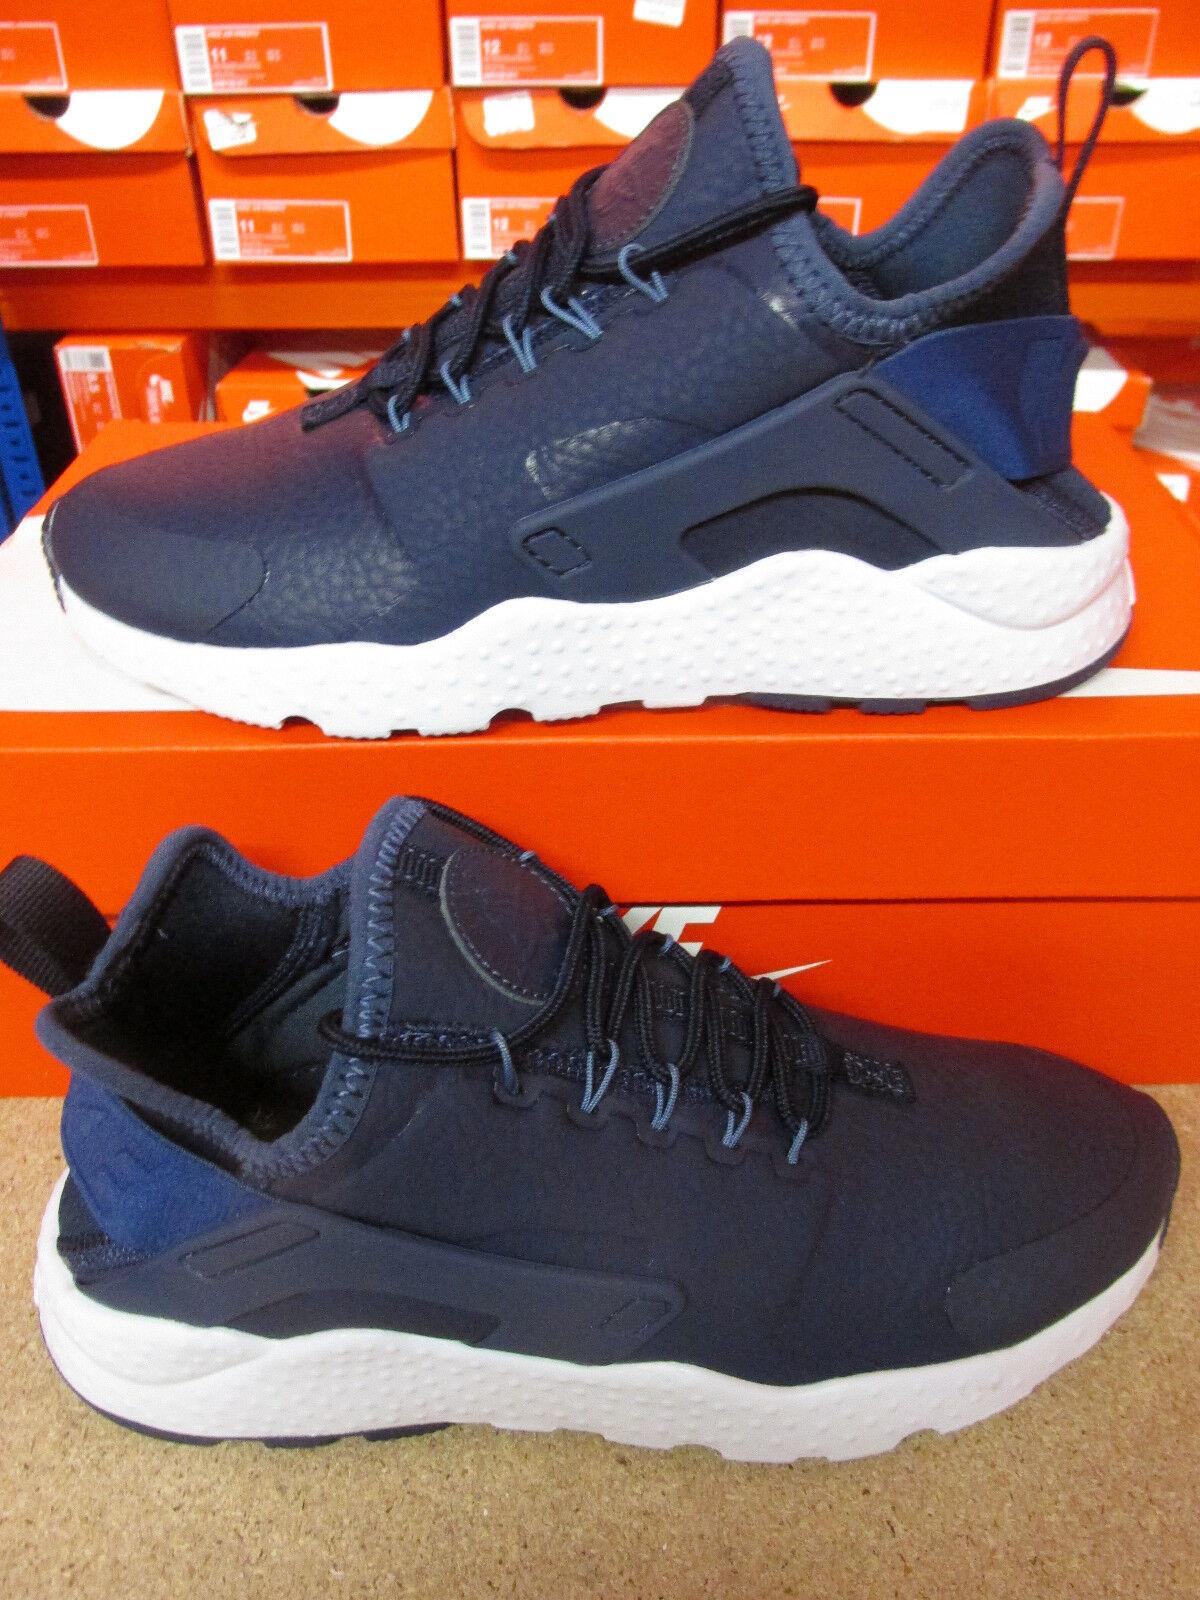 Nike Femmes Huarache Série Ultra Ultra Ultra Prm Basket Course 859511 400 Baskets 75b256